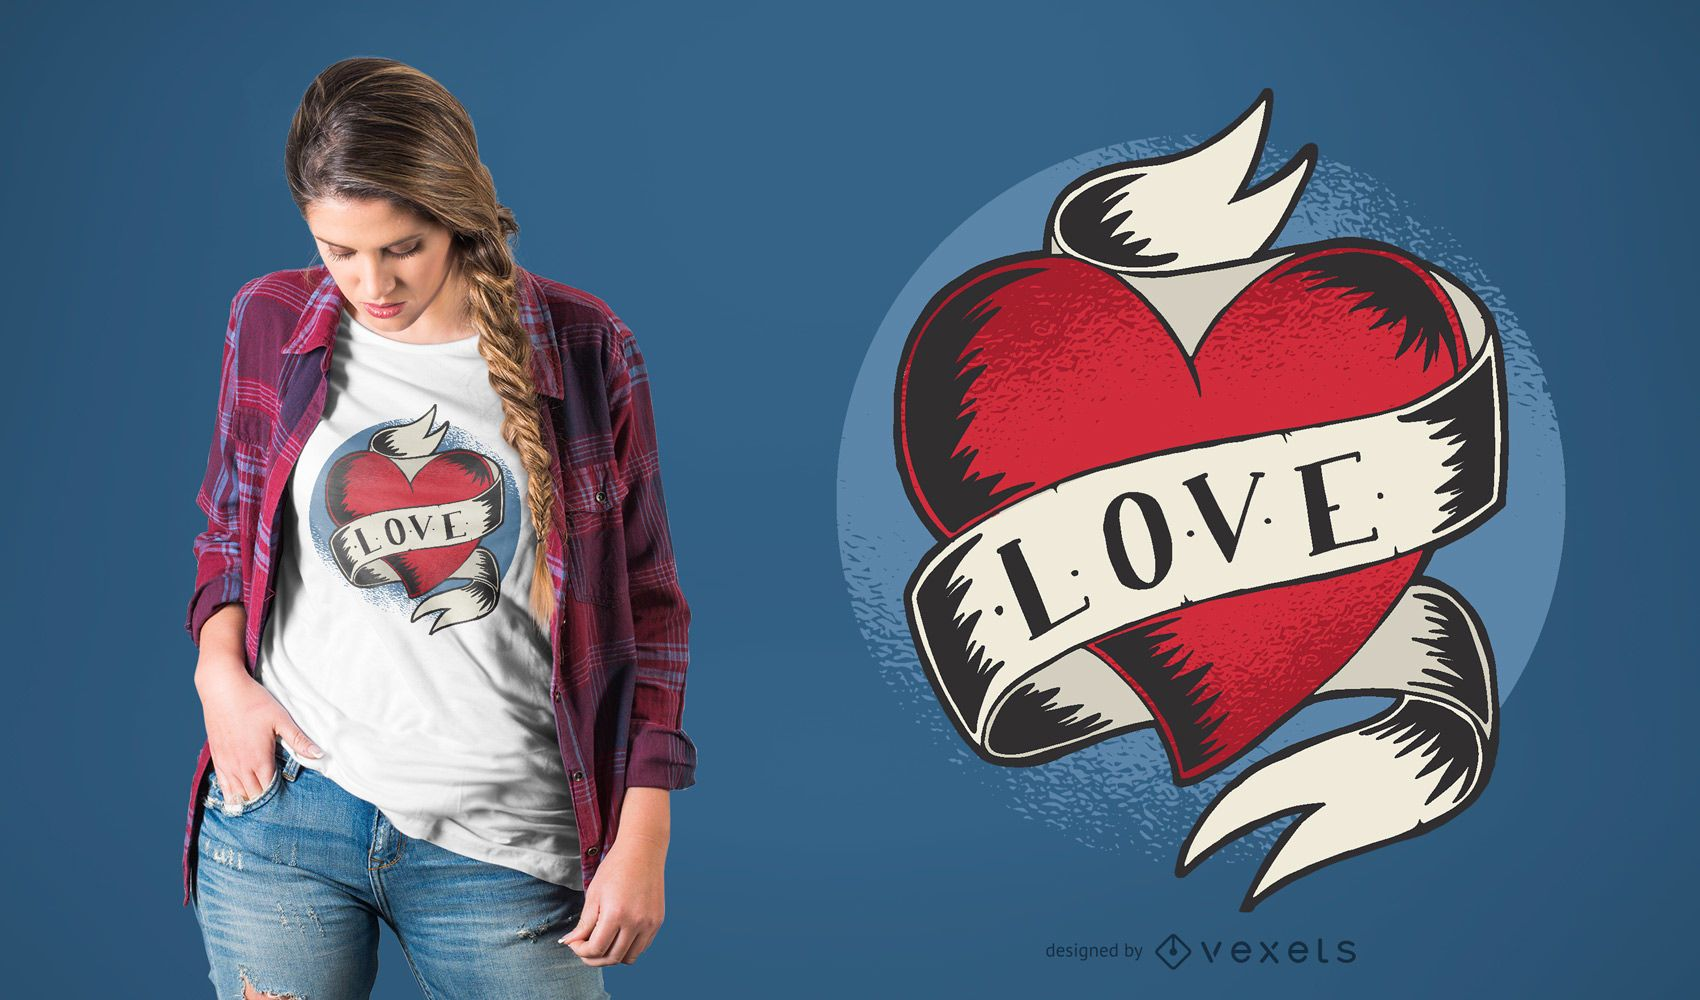 Love tattoo t-shirt design